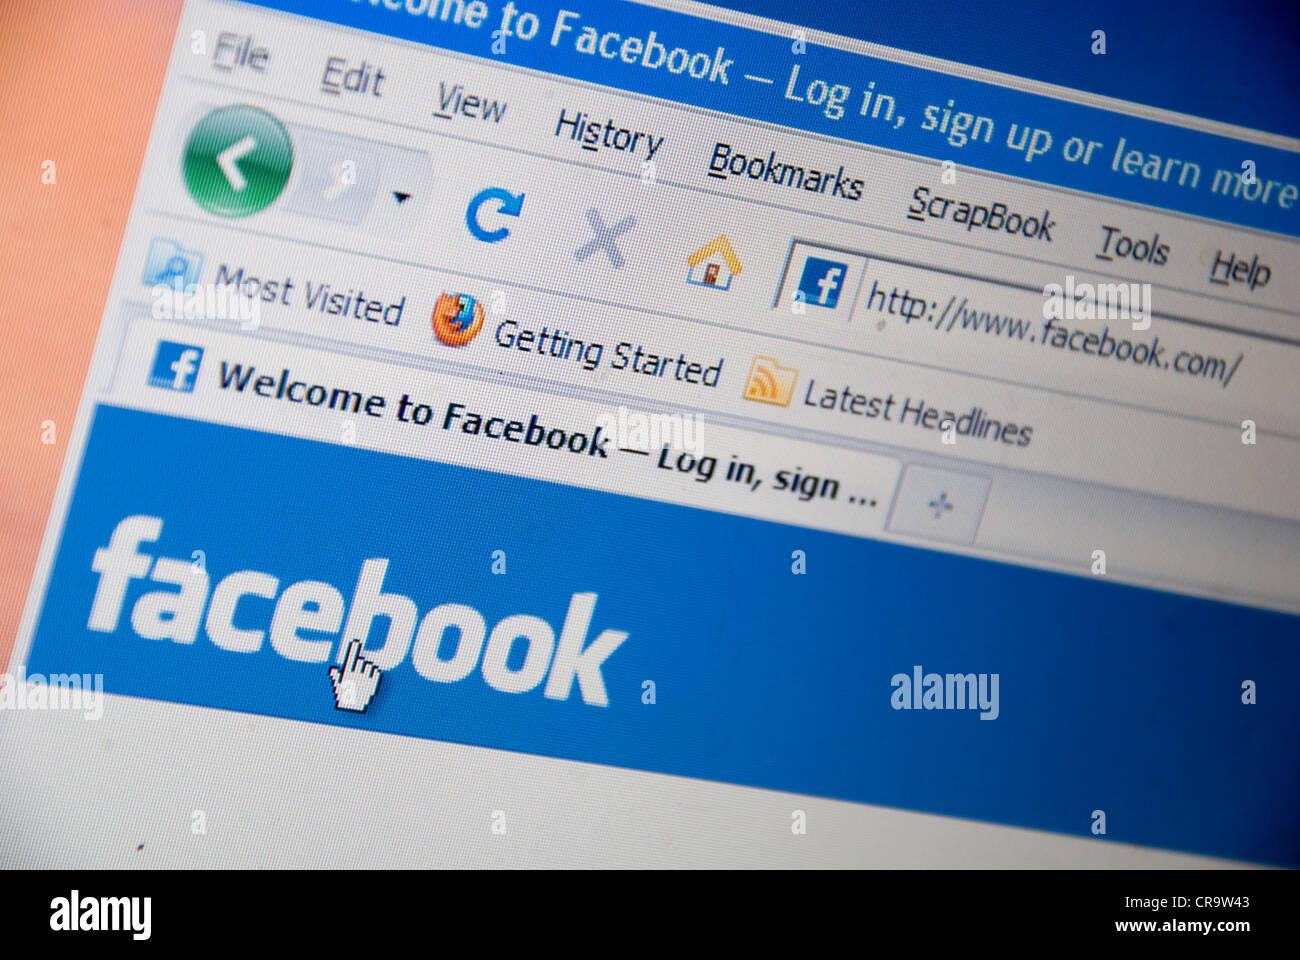 www facebook com welcome to facebook log in